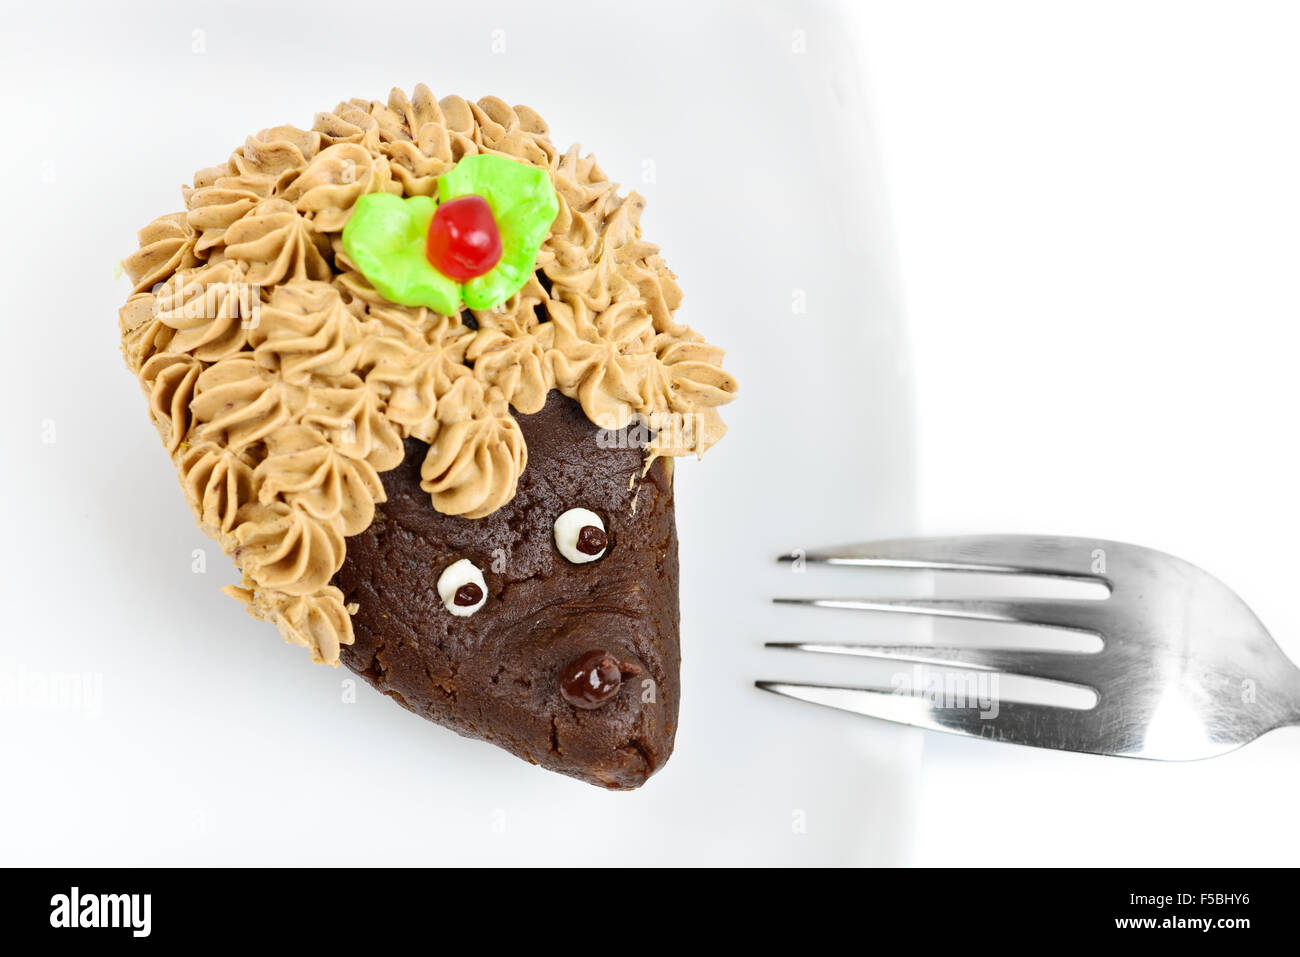 Chocolate cake decorated as hedgehog on white dish isolated Stock Photo